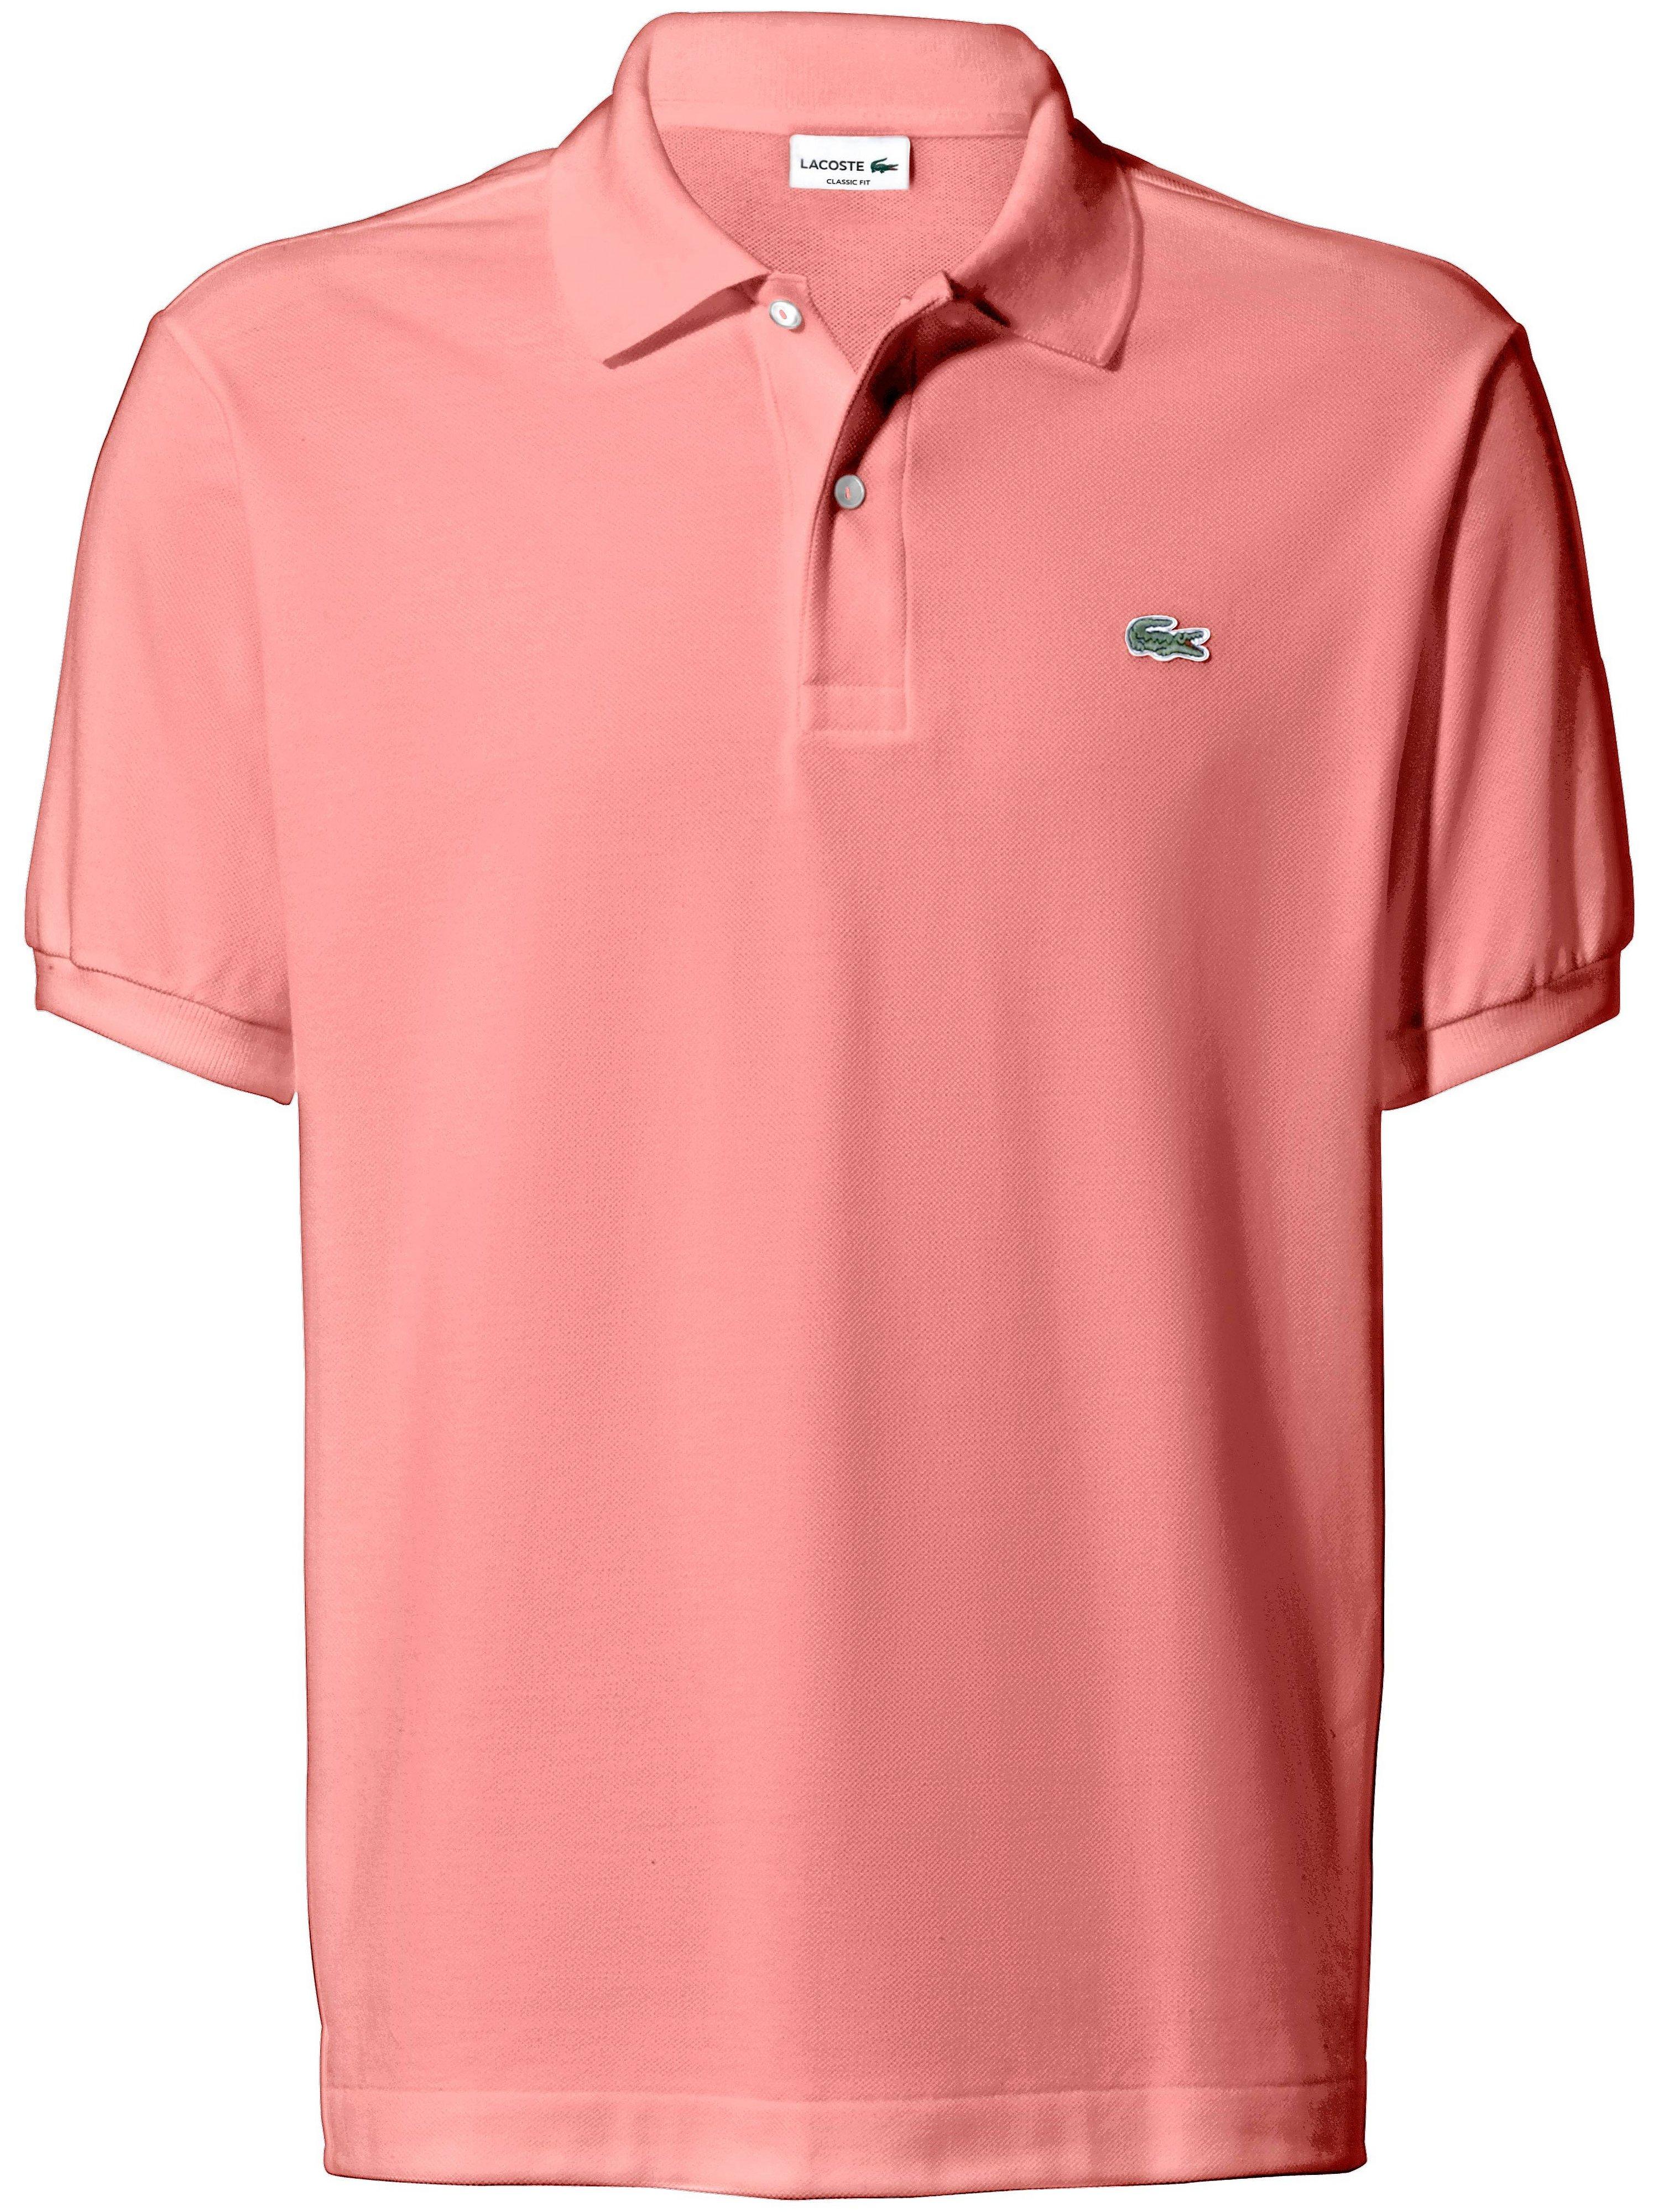 Poloshirt Fra Lacoste rosé